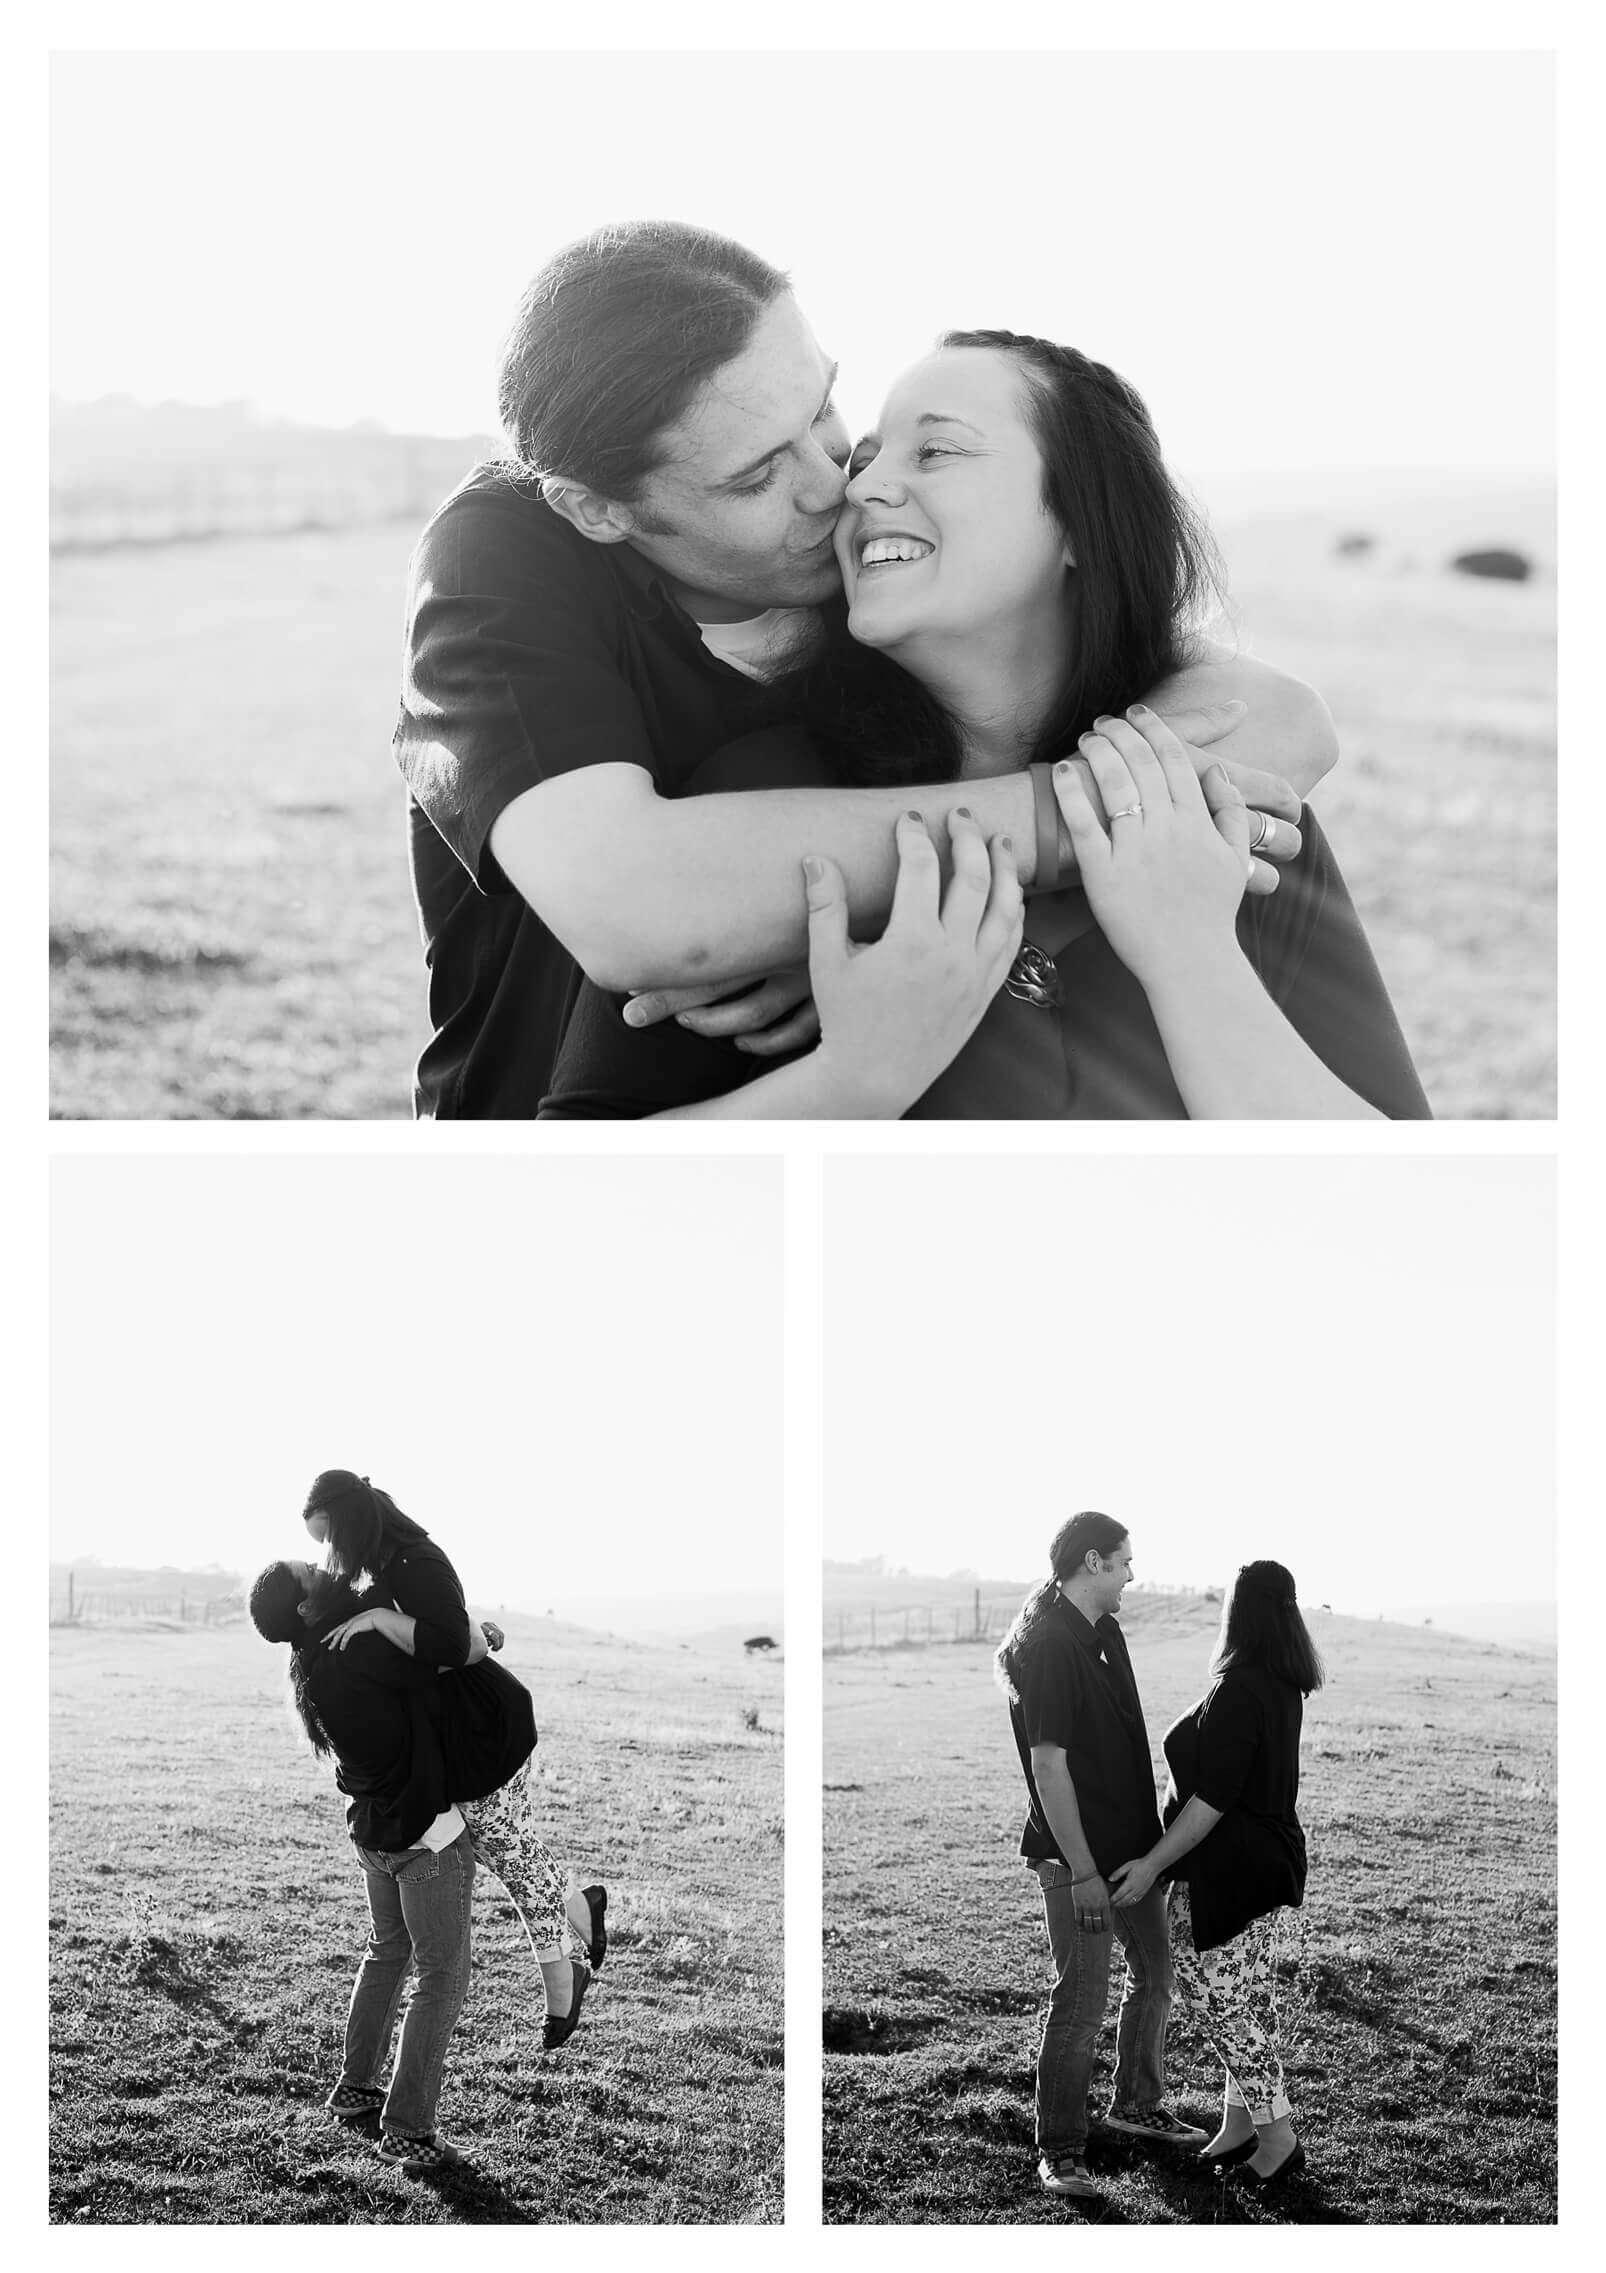 Newhaven Engagement Photographer Portraits | East Sussex pre-wedding photographer